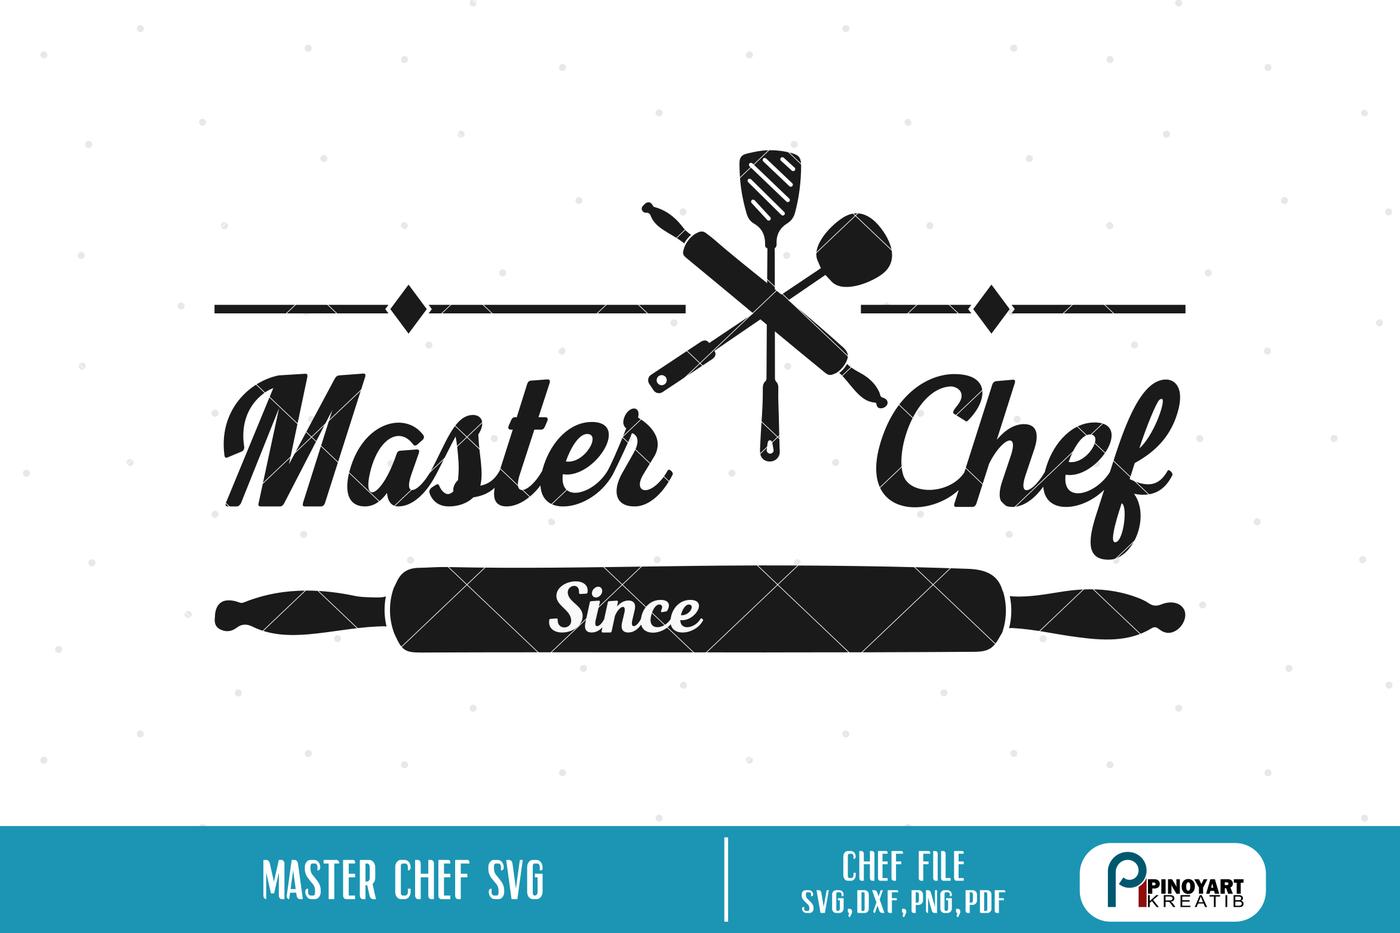 Master Chef Svg Chef Svg Kitchen Svg Kitchen Svg File Cooking Svg